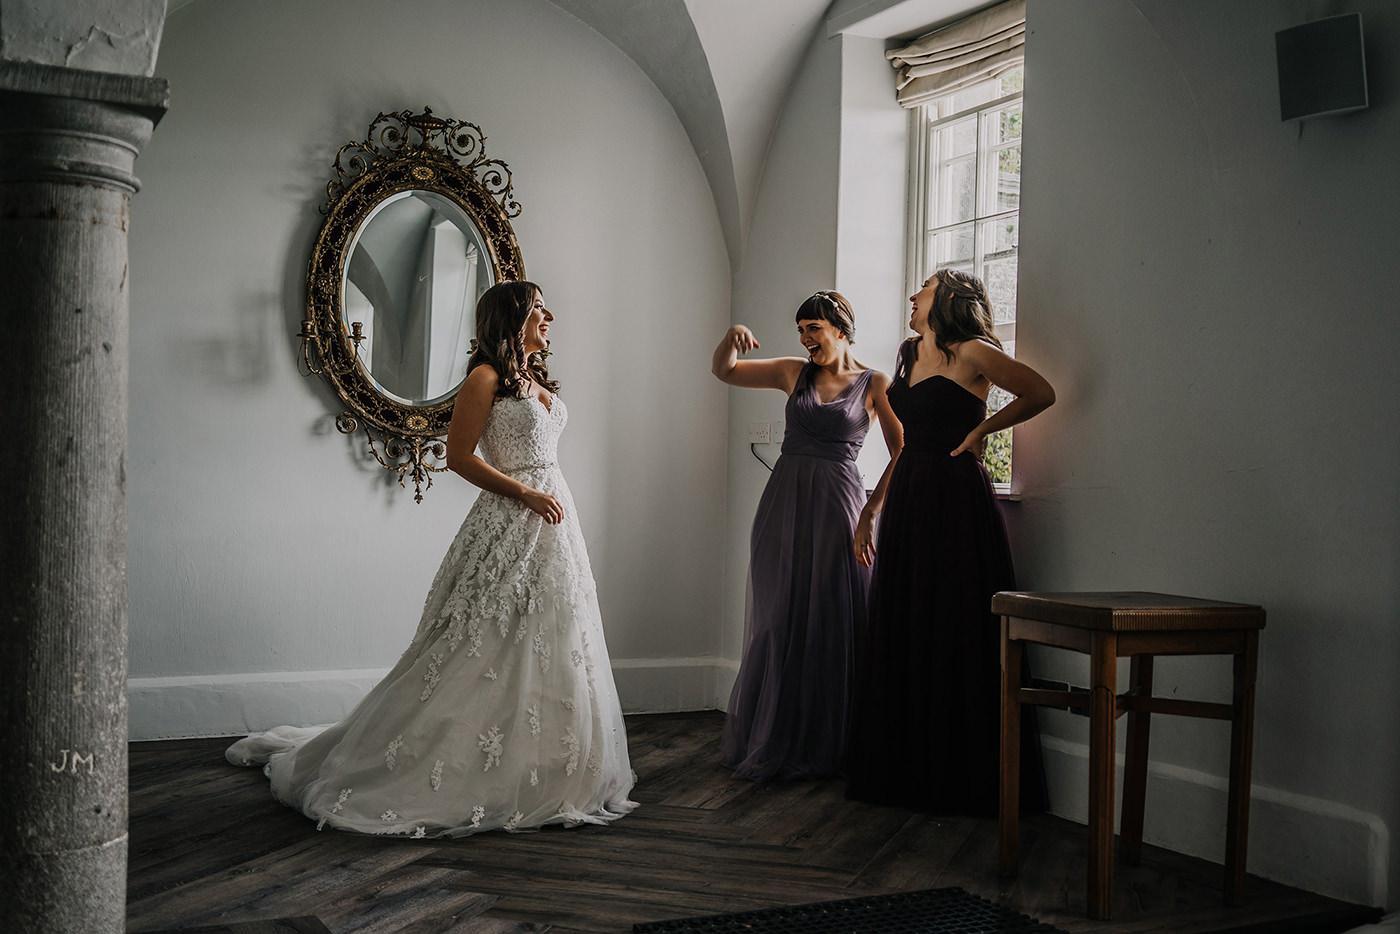 Belinter_House_Wedding044.jpg